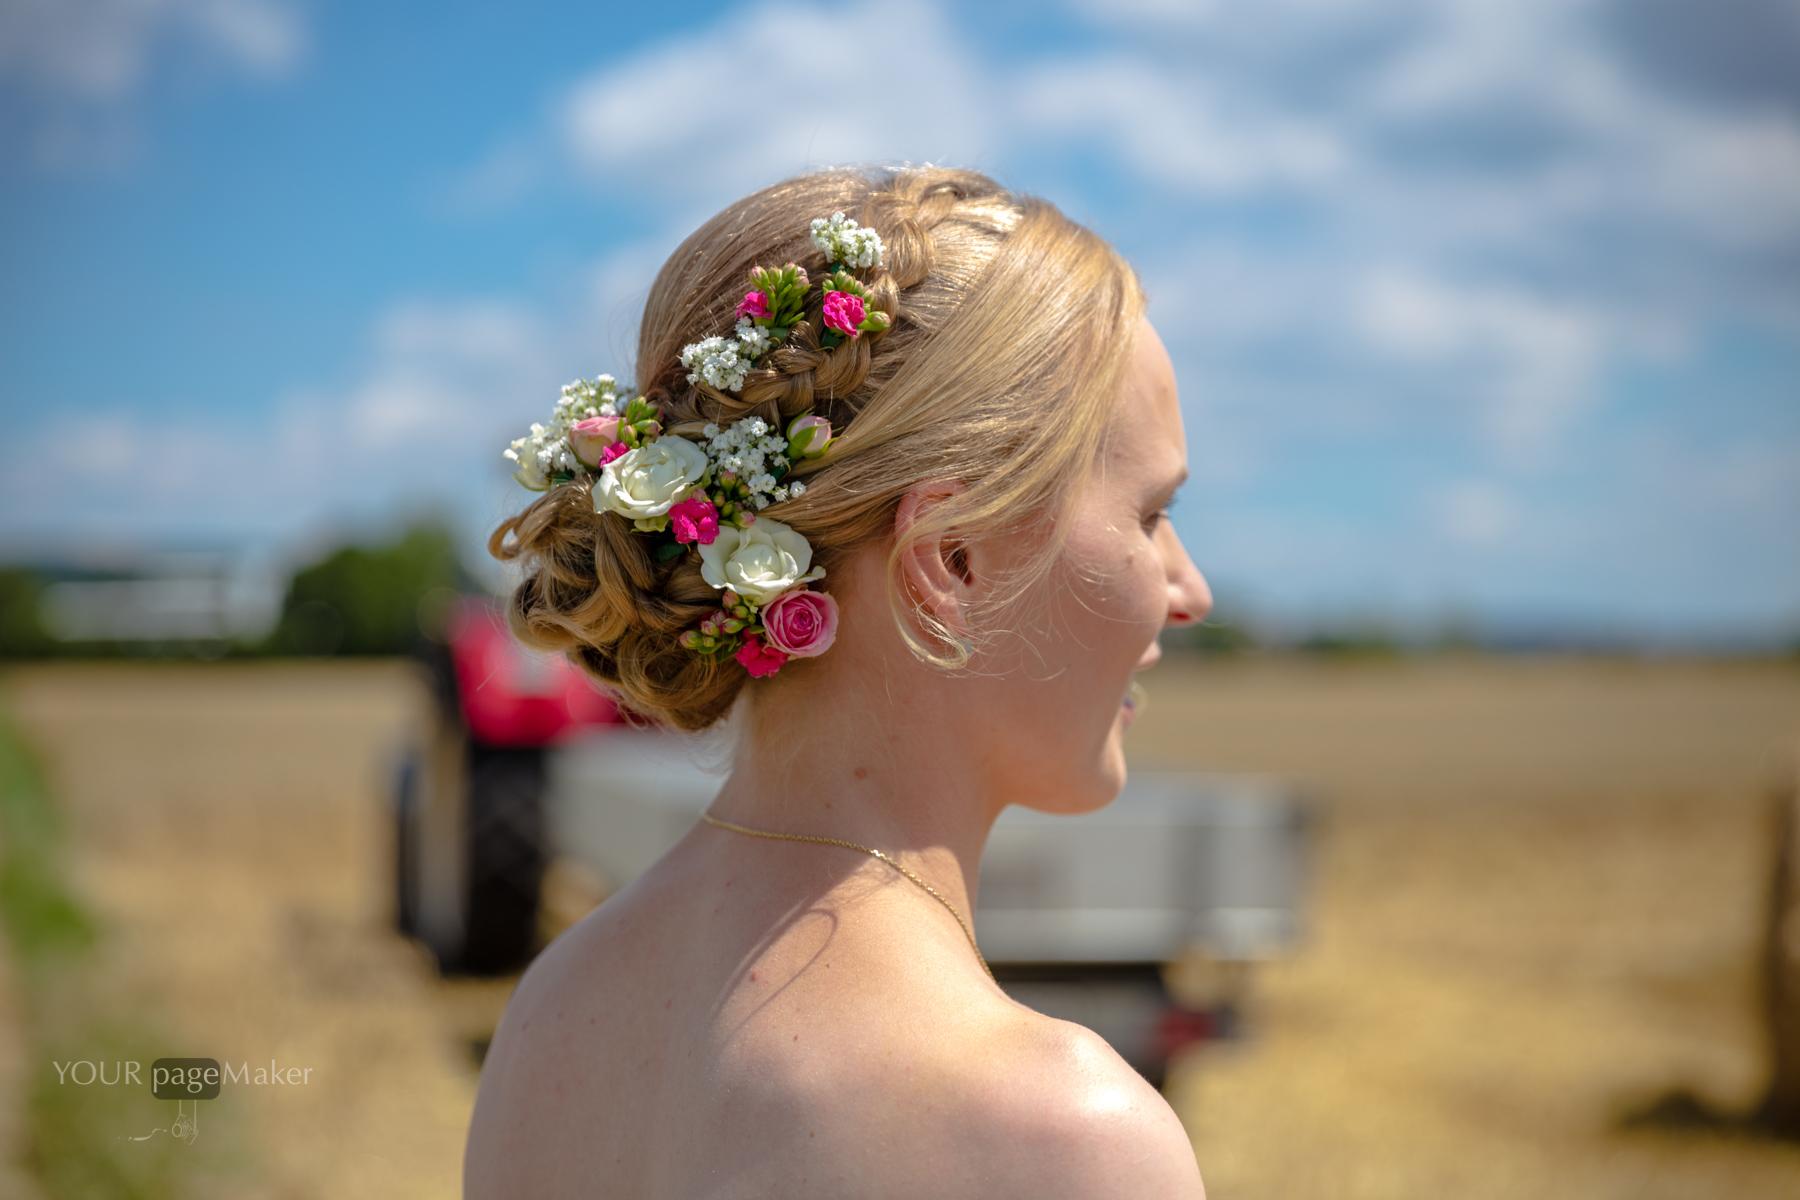 Hochzeitfotoografie by YOUR pageMaker